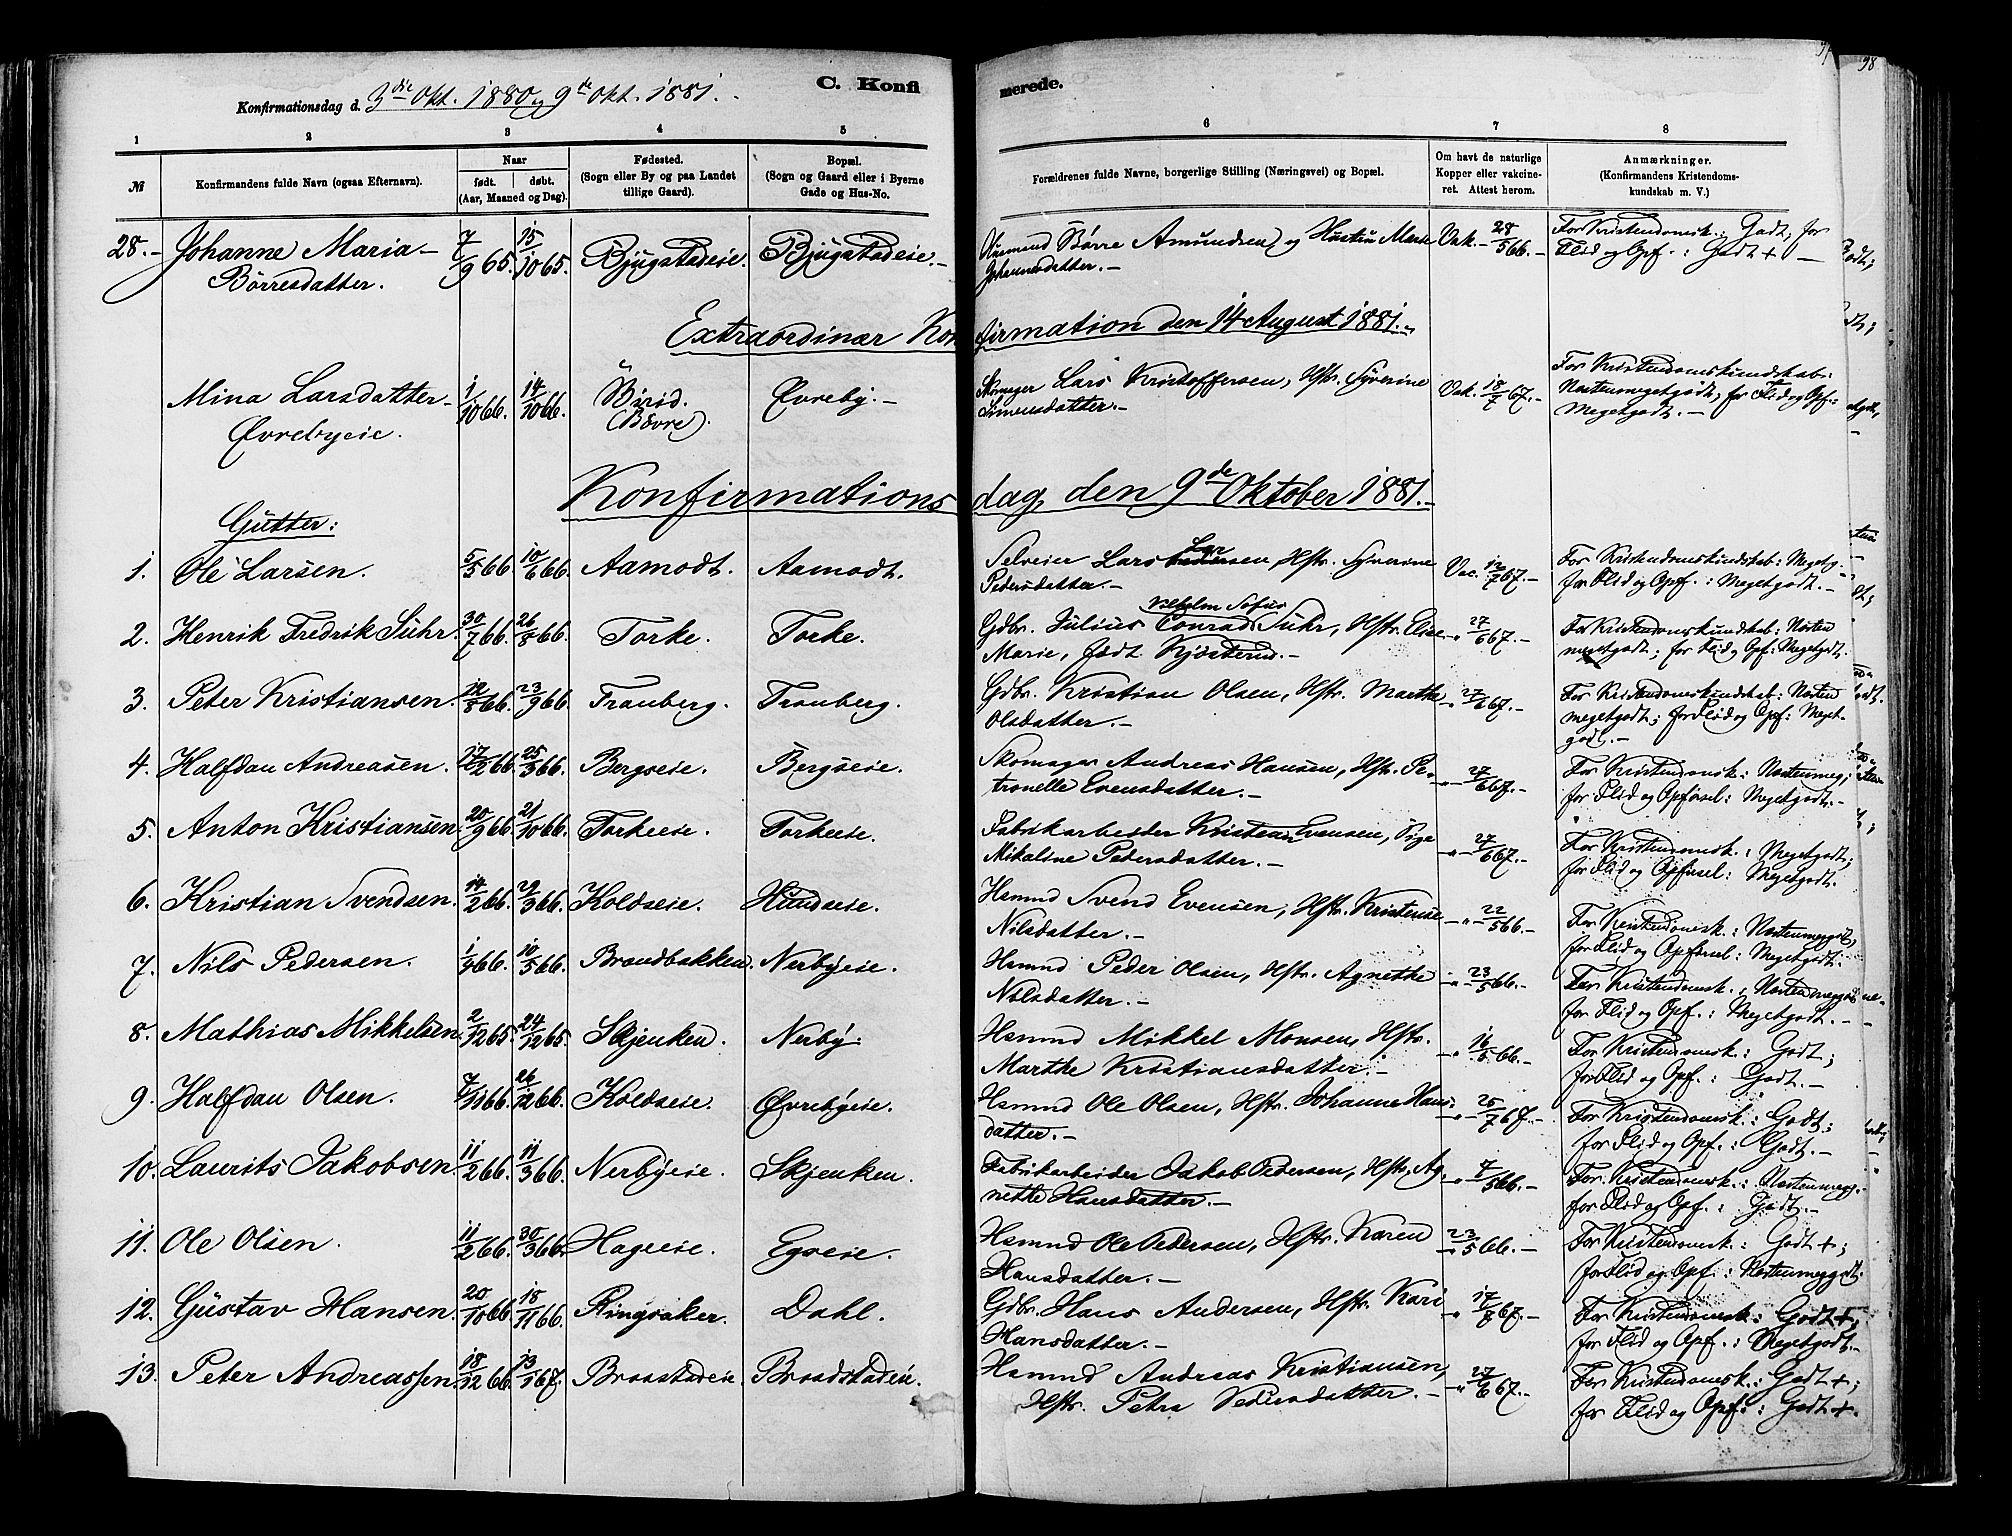 SAH, Vardal prestekontor, H/Ha/Haa/L0009: Ministerialbok nr. 9, 1878-1892, s. 97